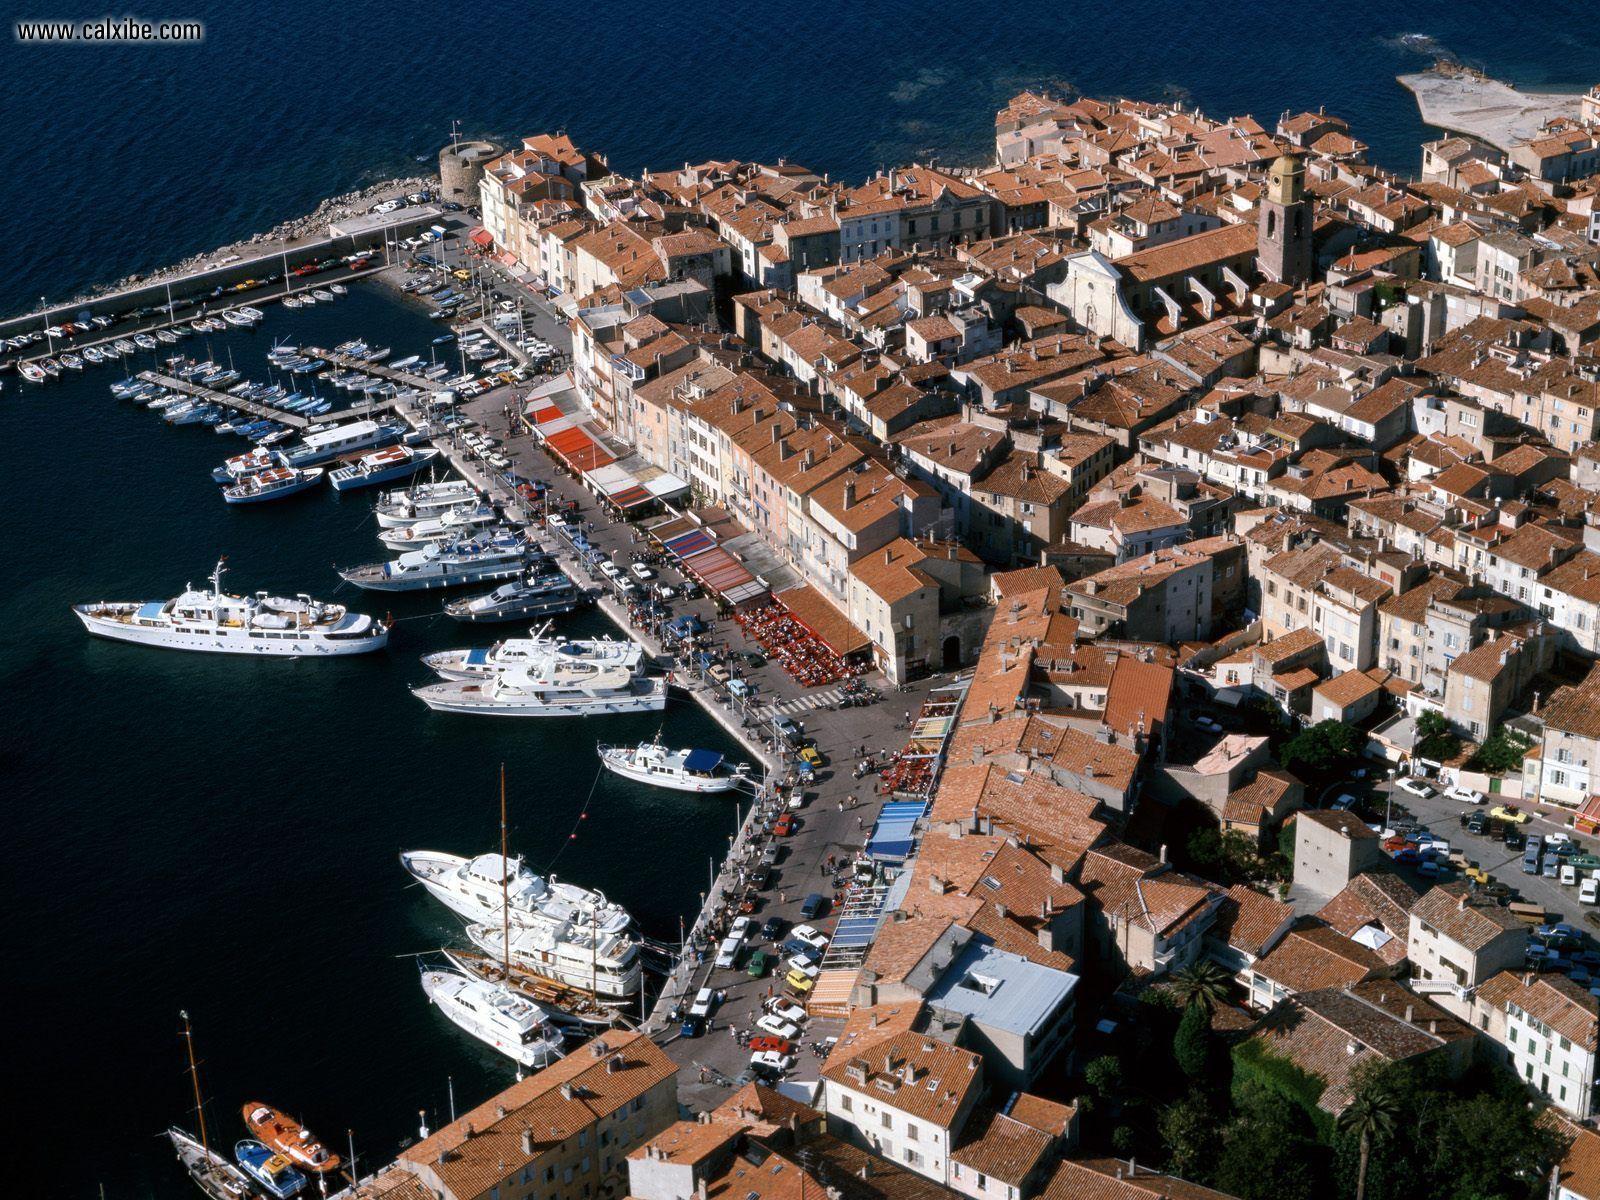 St Tropez France Wallpapers   Top St Tropez France 1600x1200